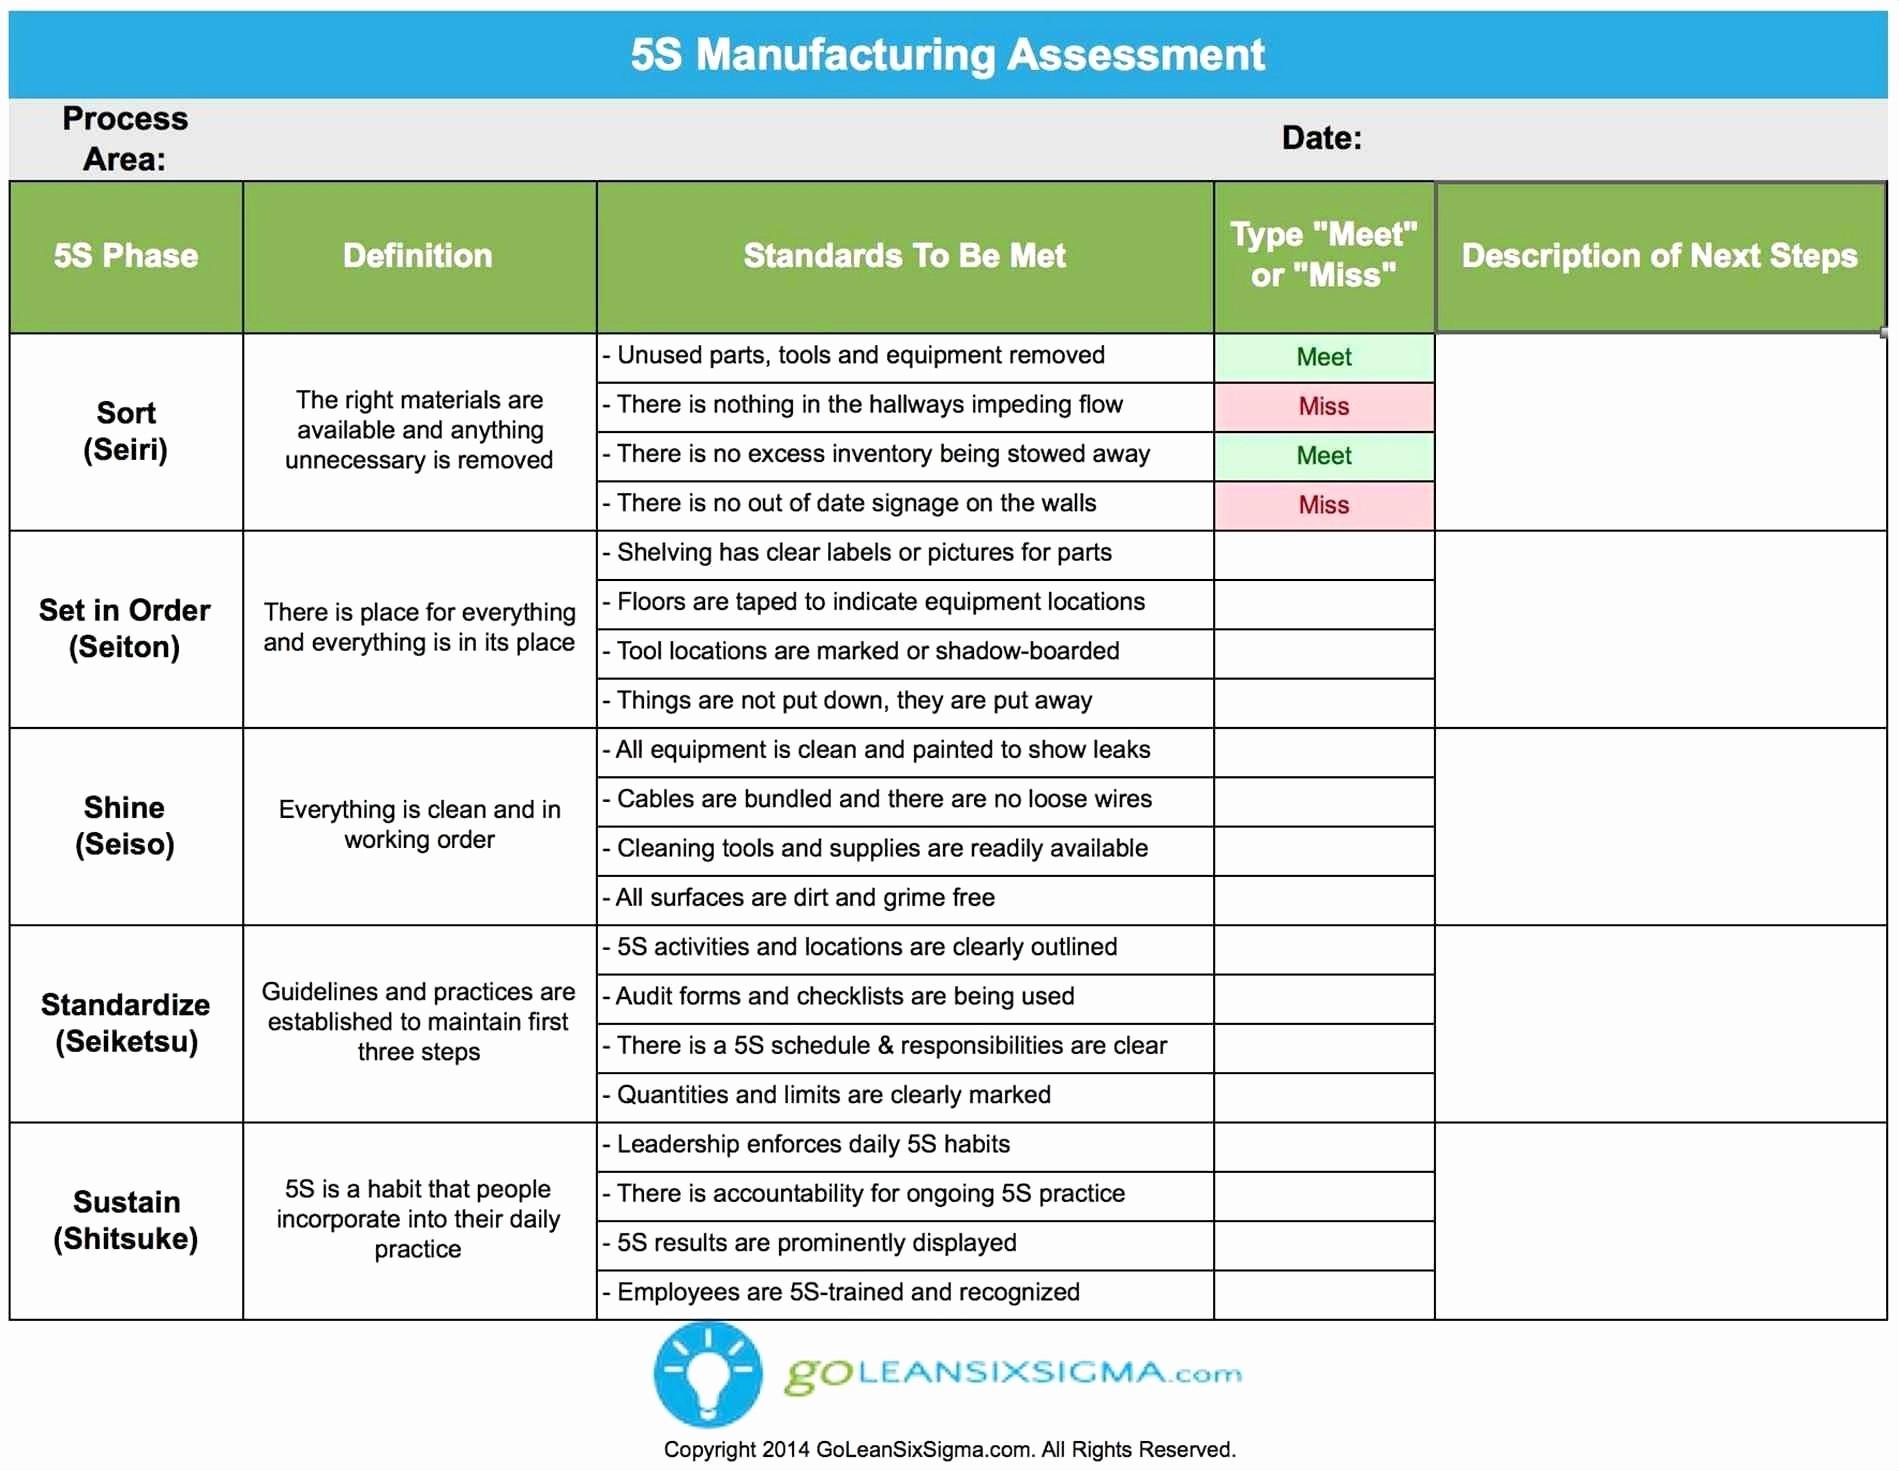 Production Downtime Spreadsheet Regarding Machine Downtime Spreadsheet Or Downtime Tracking Sheet Best 9 Best